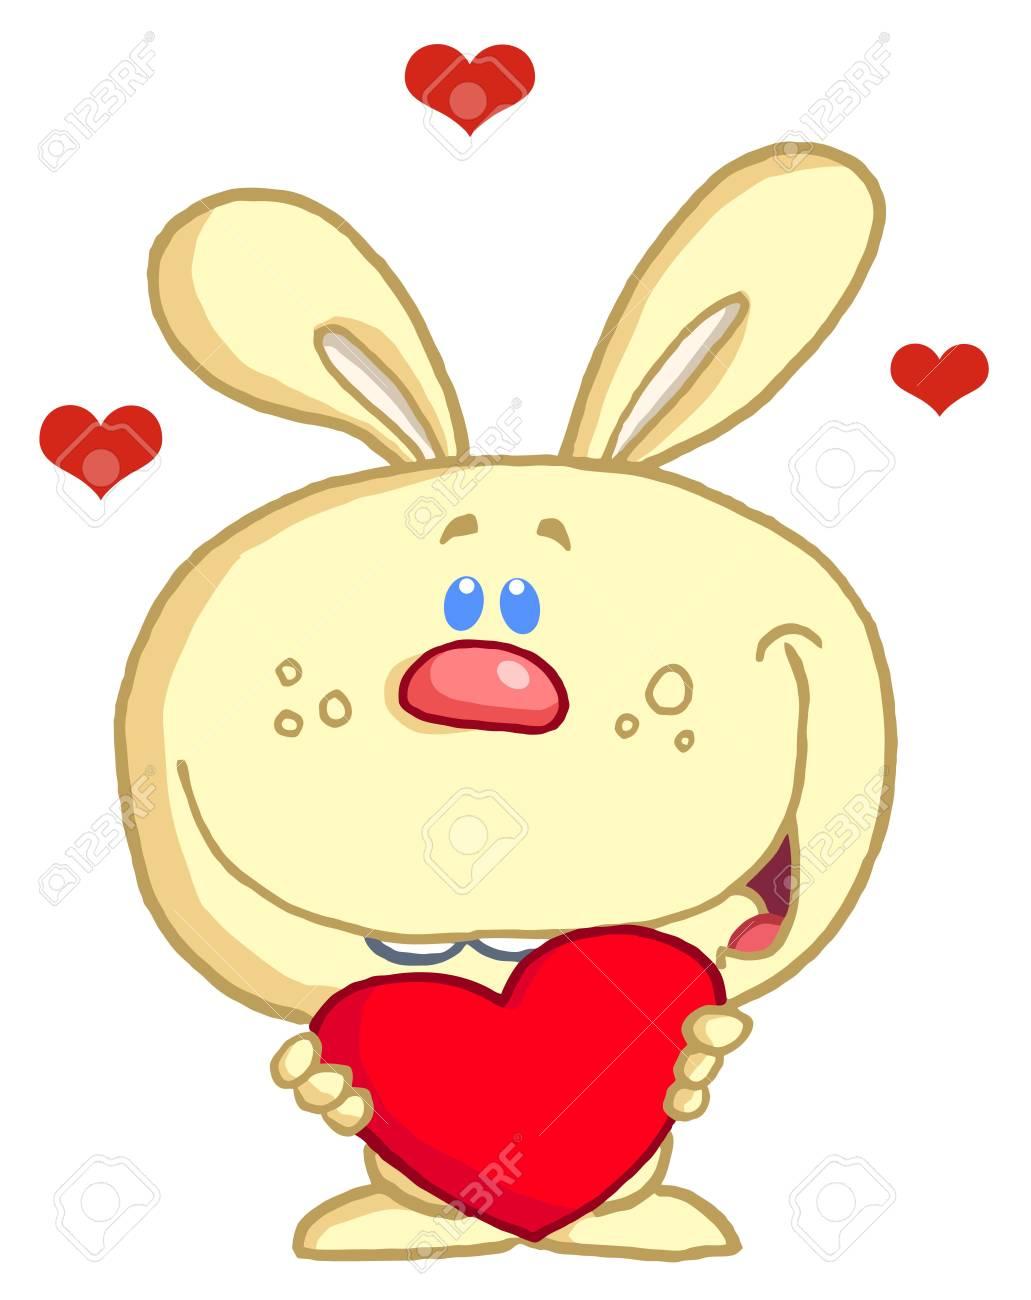 Romantic Yellow Rabbit With Heart Stock Vector - 6792732